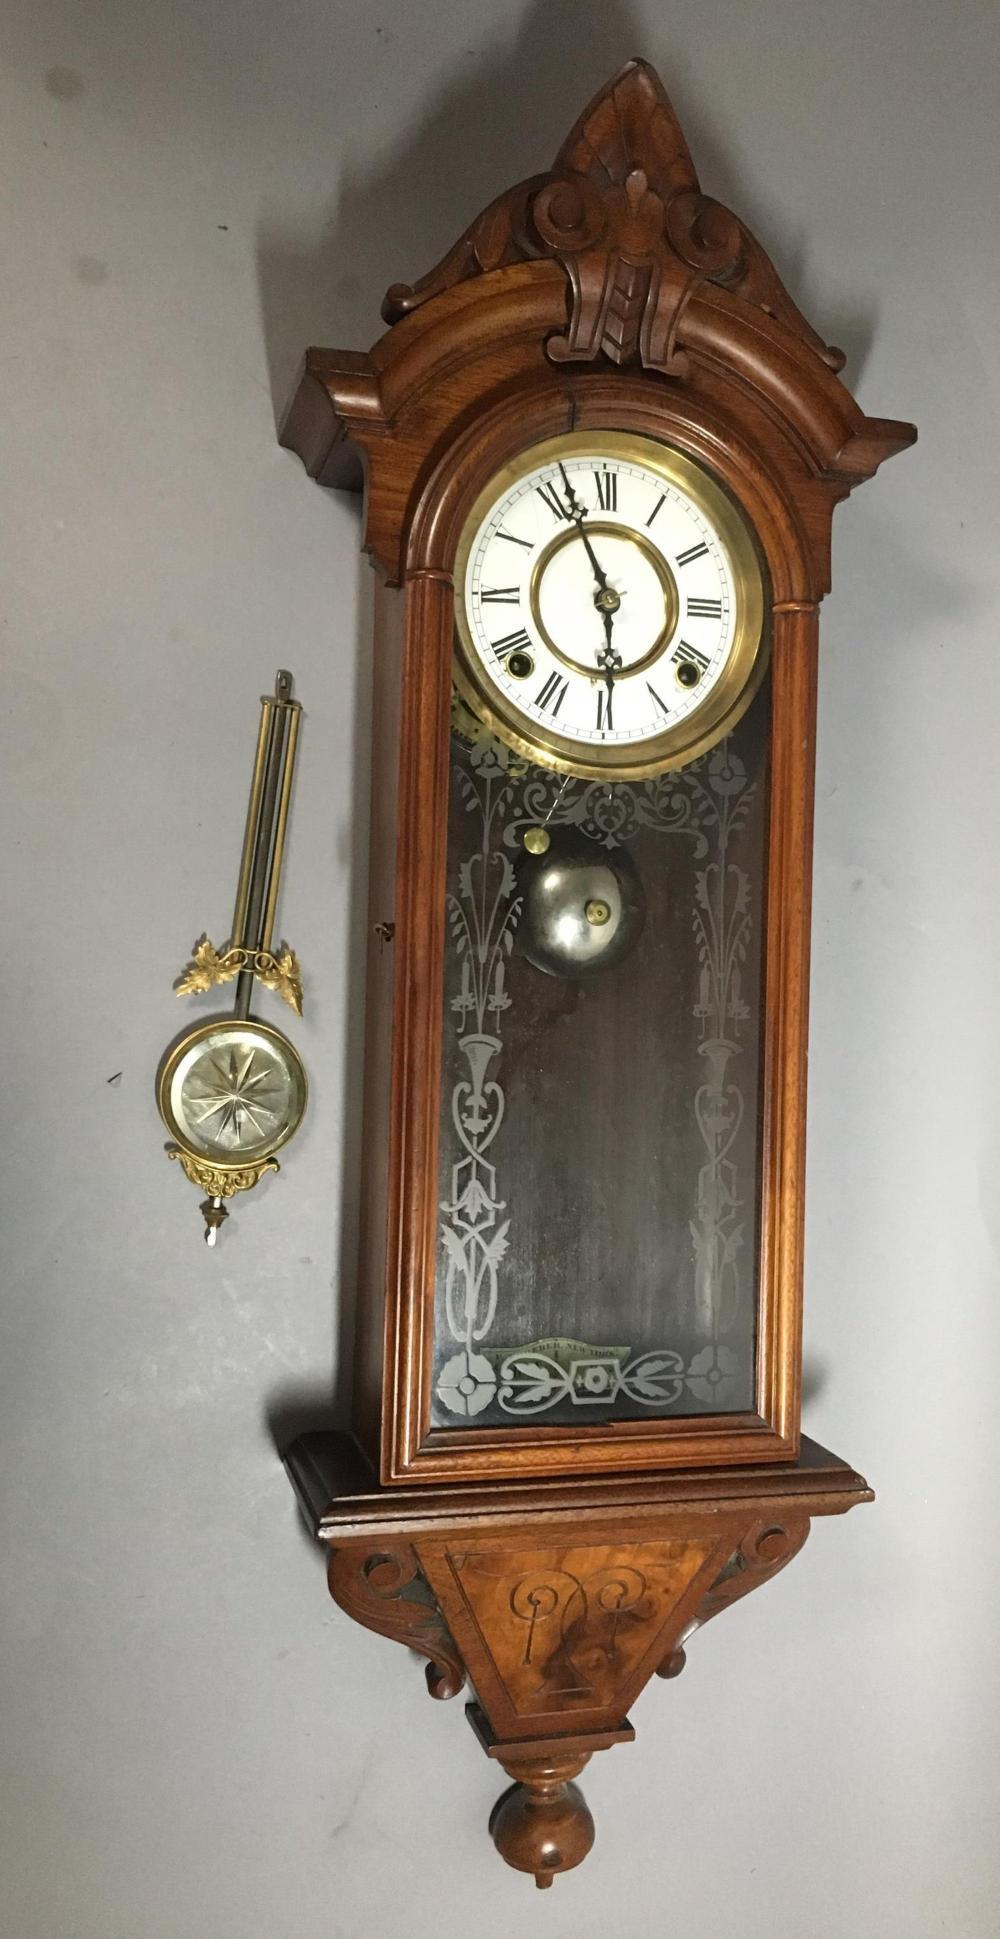 F. Kroeber Hanging Regulator No. 31 Wall Clock